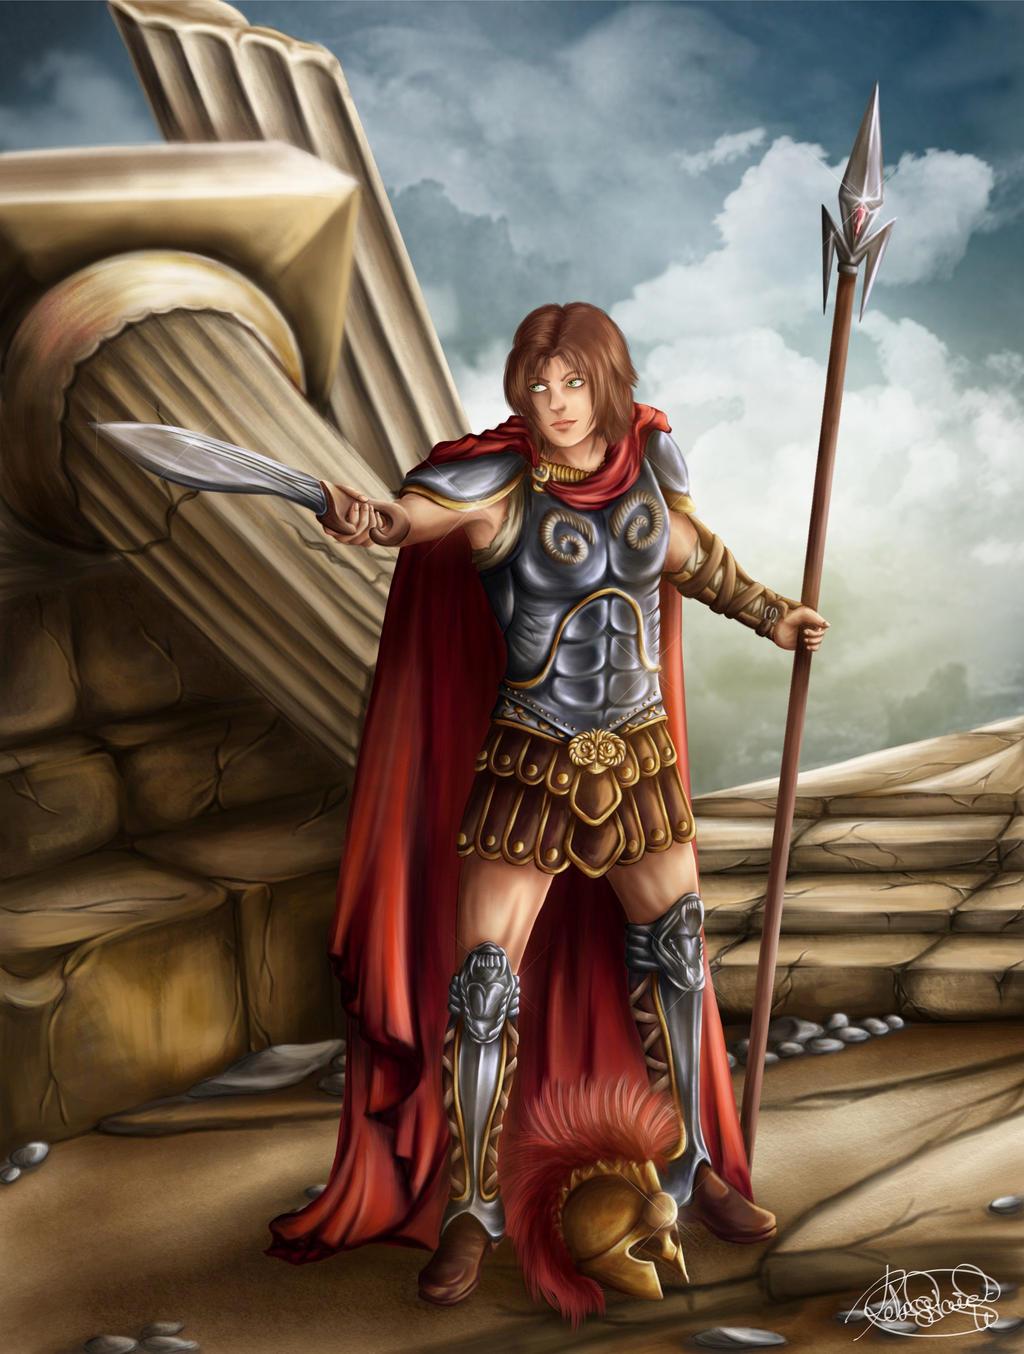 Ares God of War by ladamadelasestrellas on DeviantArt